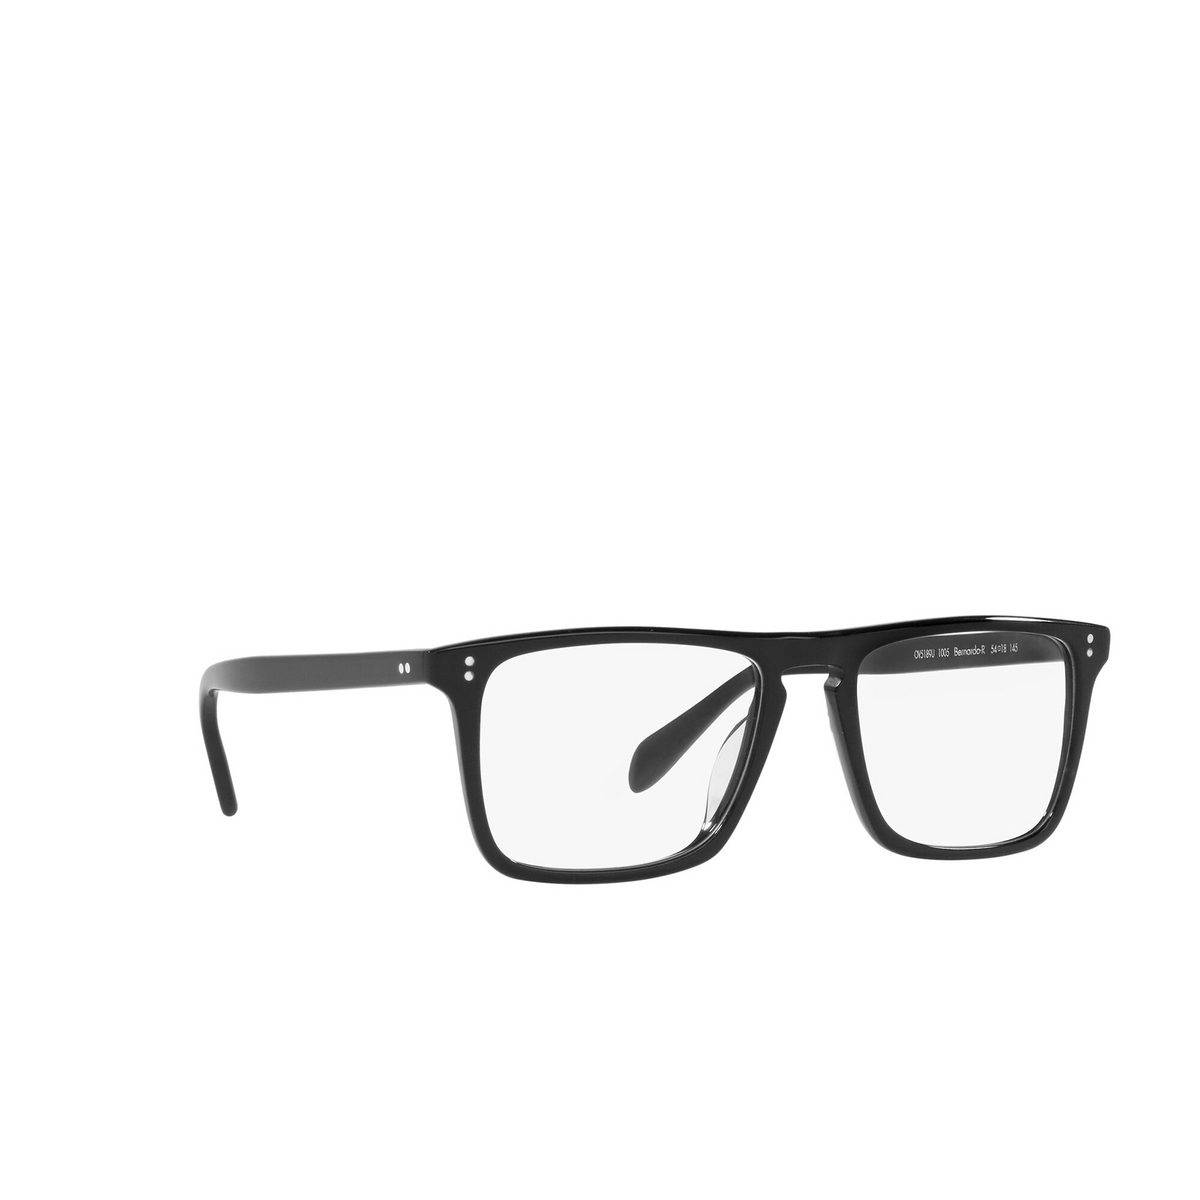 Oliver Peoples® Square Eyeglasses: Bernardo-r OV5189U color Black 1005 - three-quarters view.